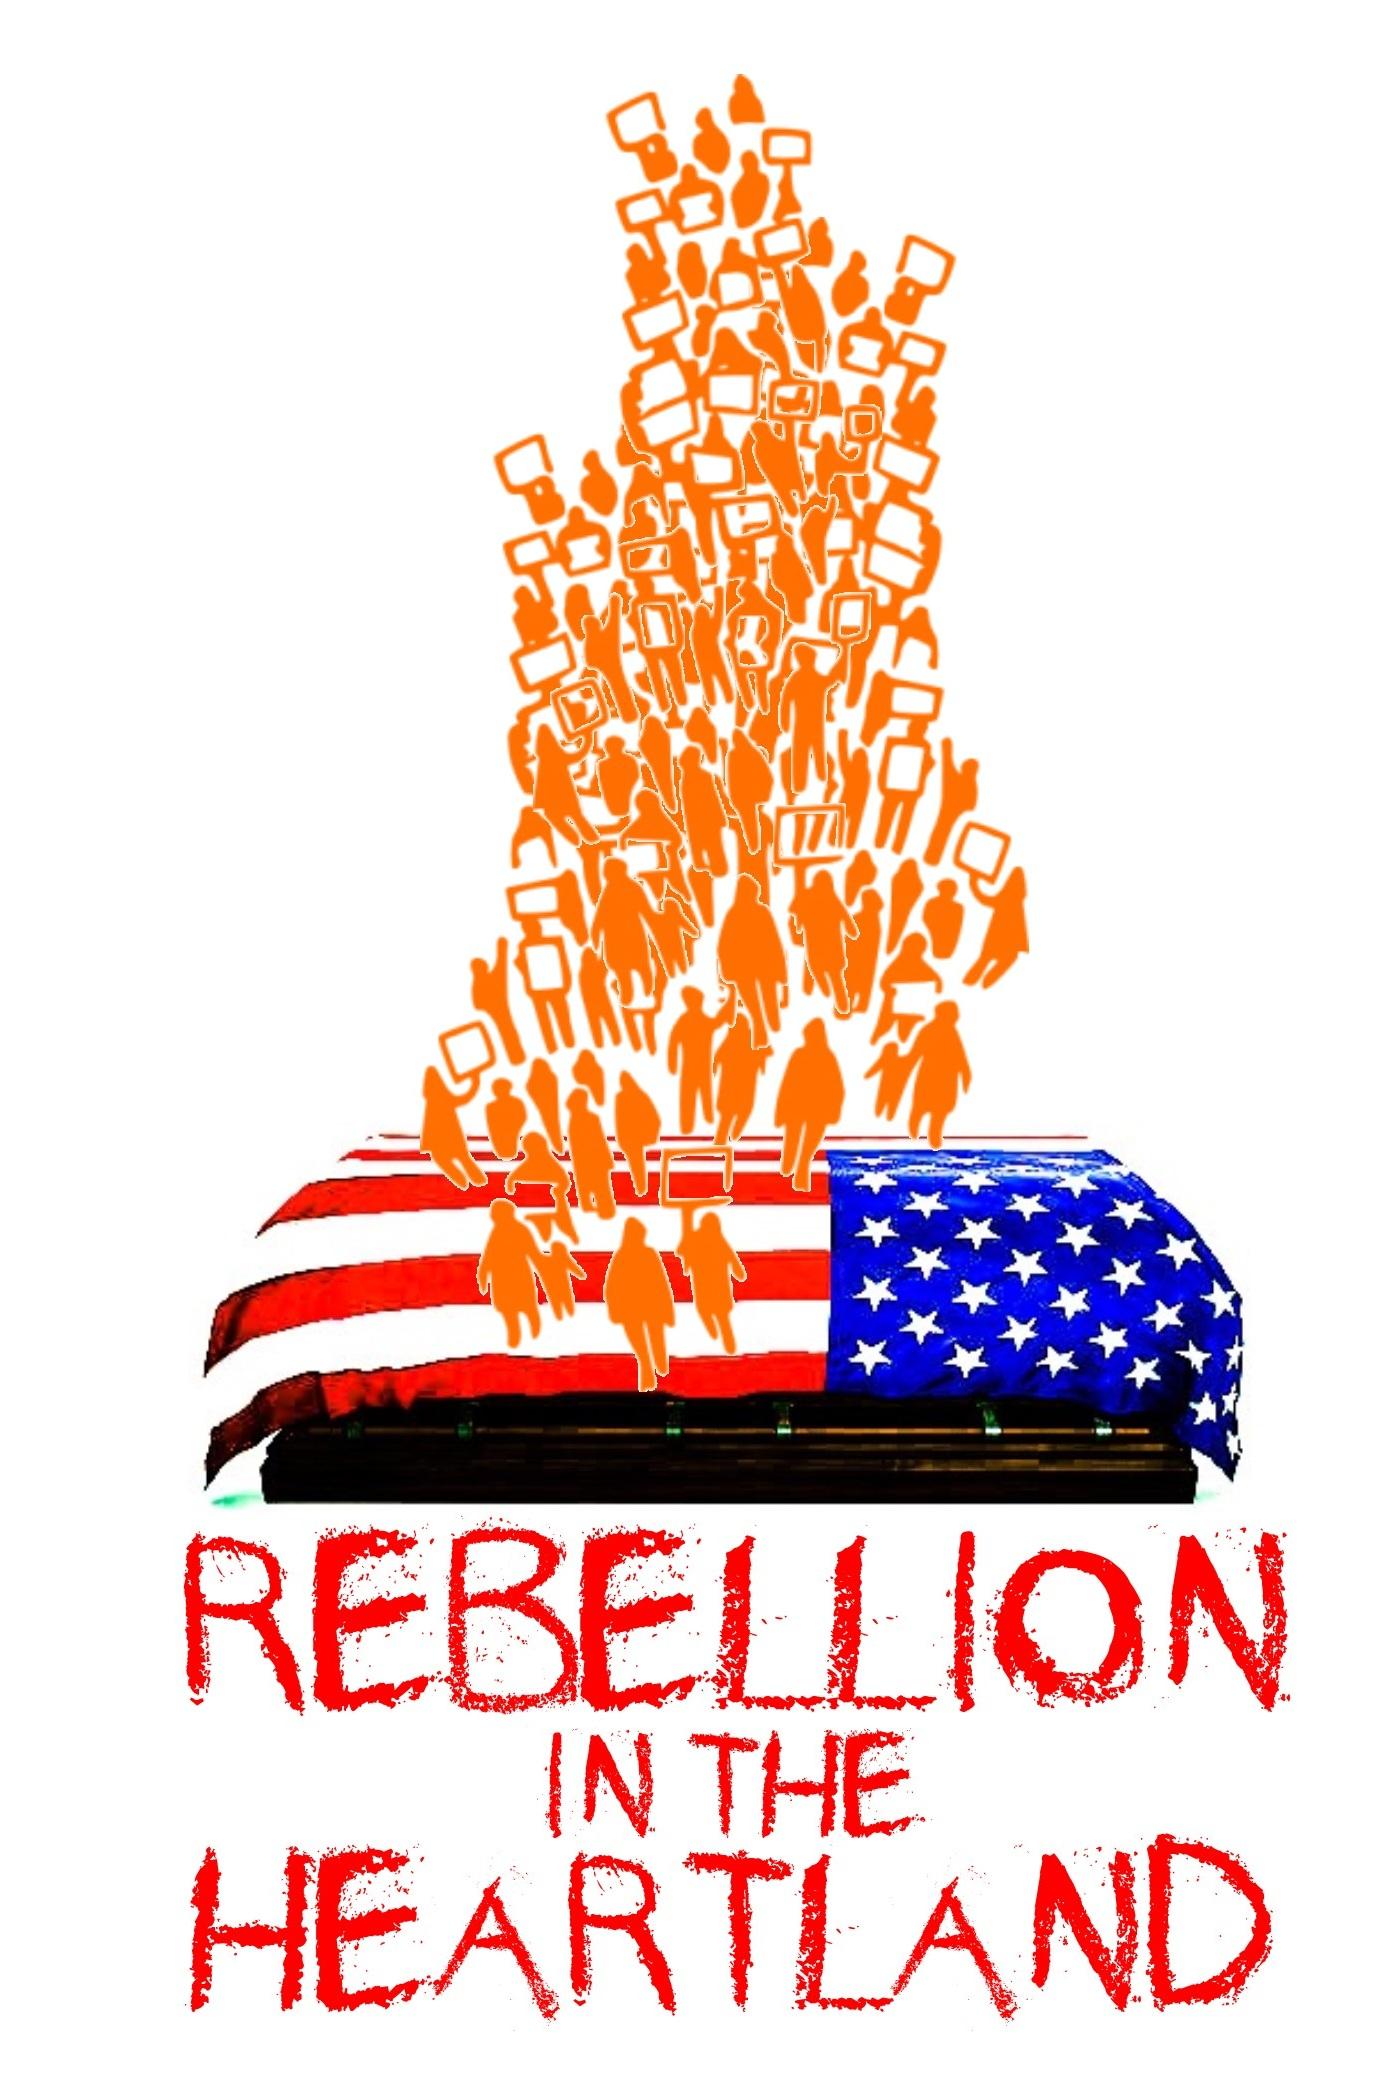 Rebellion in the Heartland Graphic.jpg